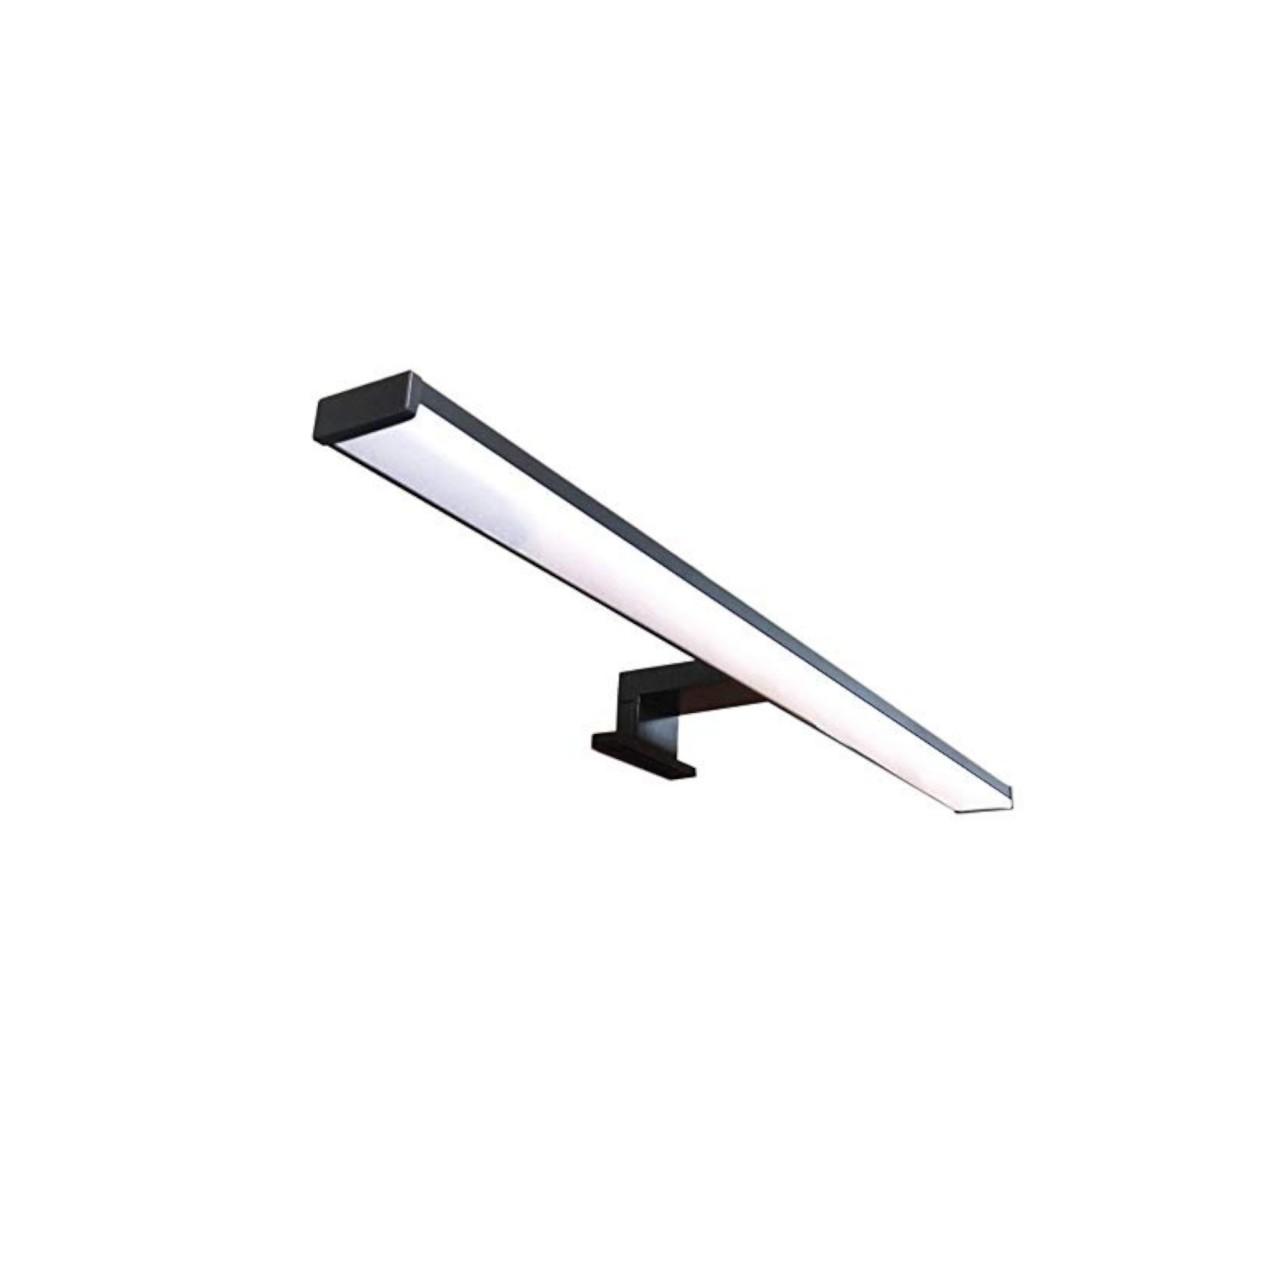 LAMPADA LED CM 40 ALLUMINIO NERO OPACO 4000 K